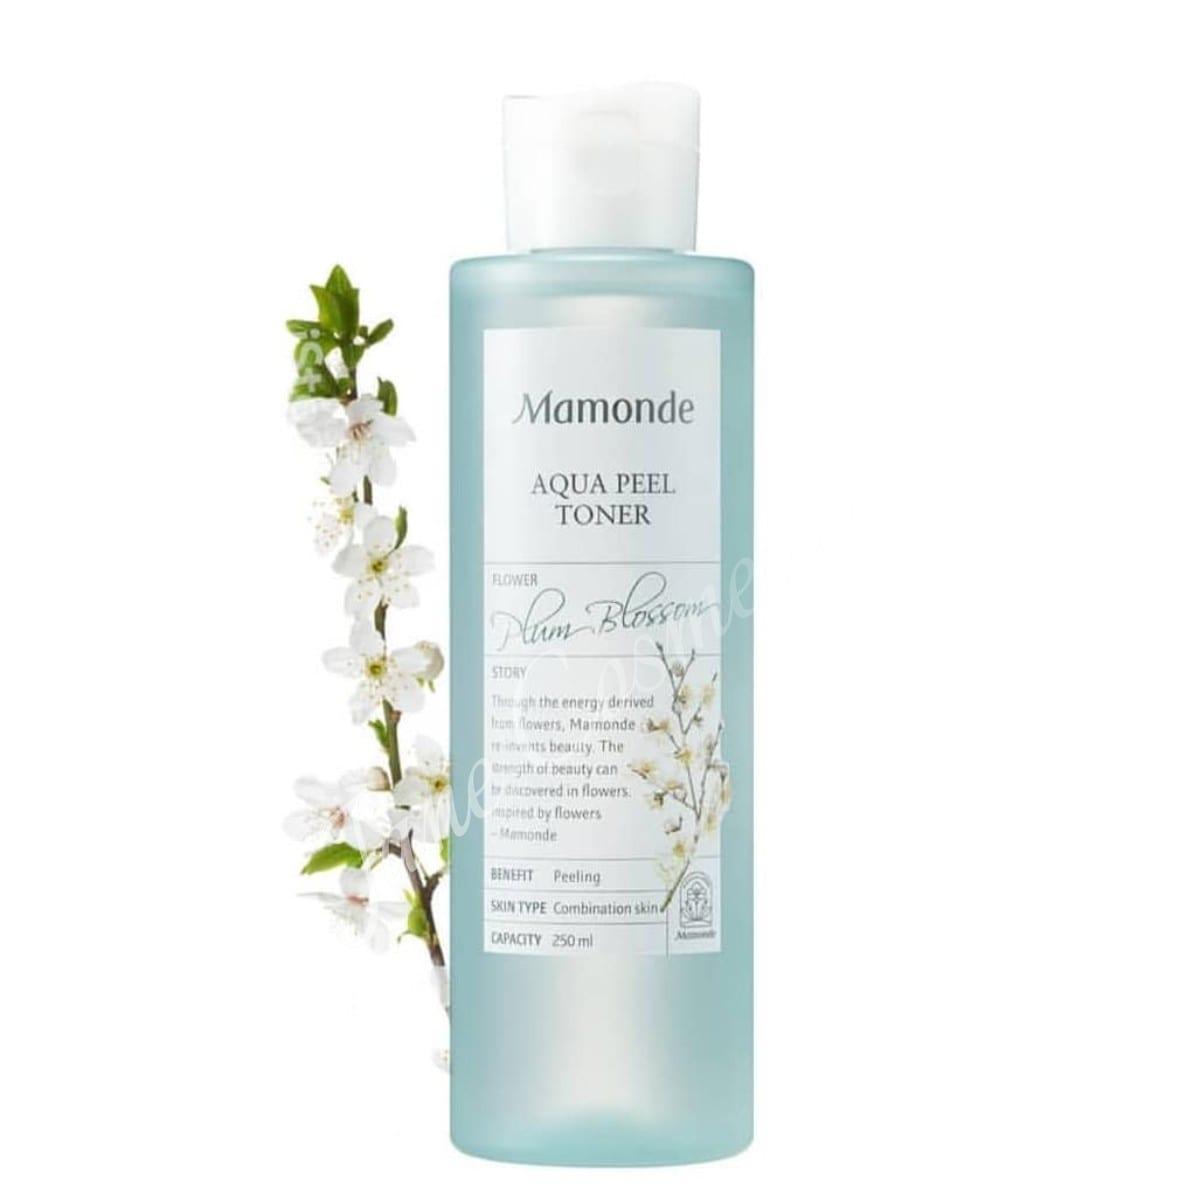 Nước toner Mamonde plum blossum